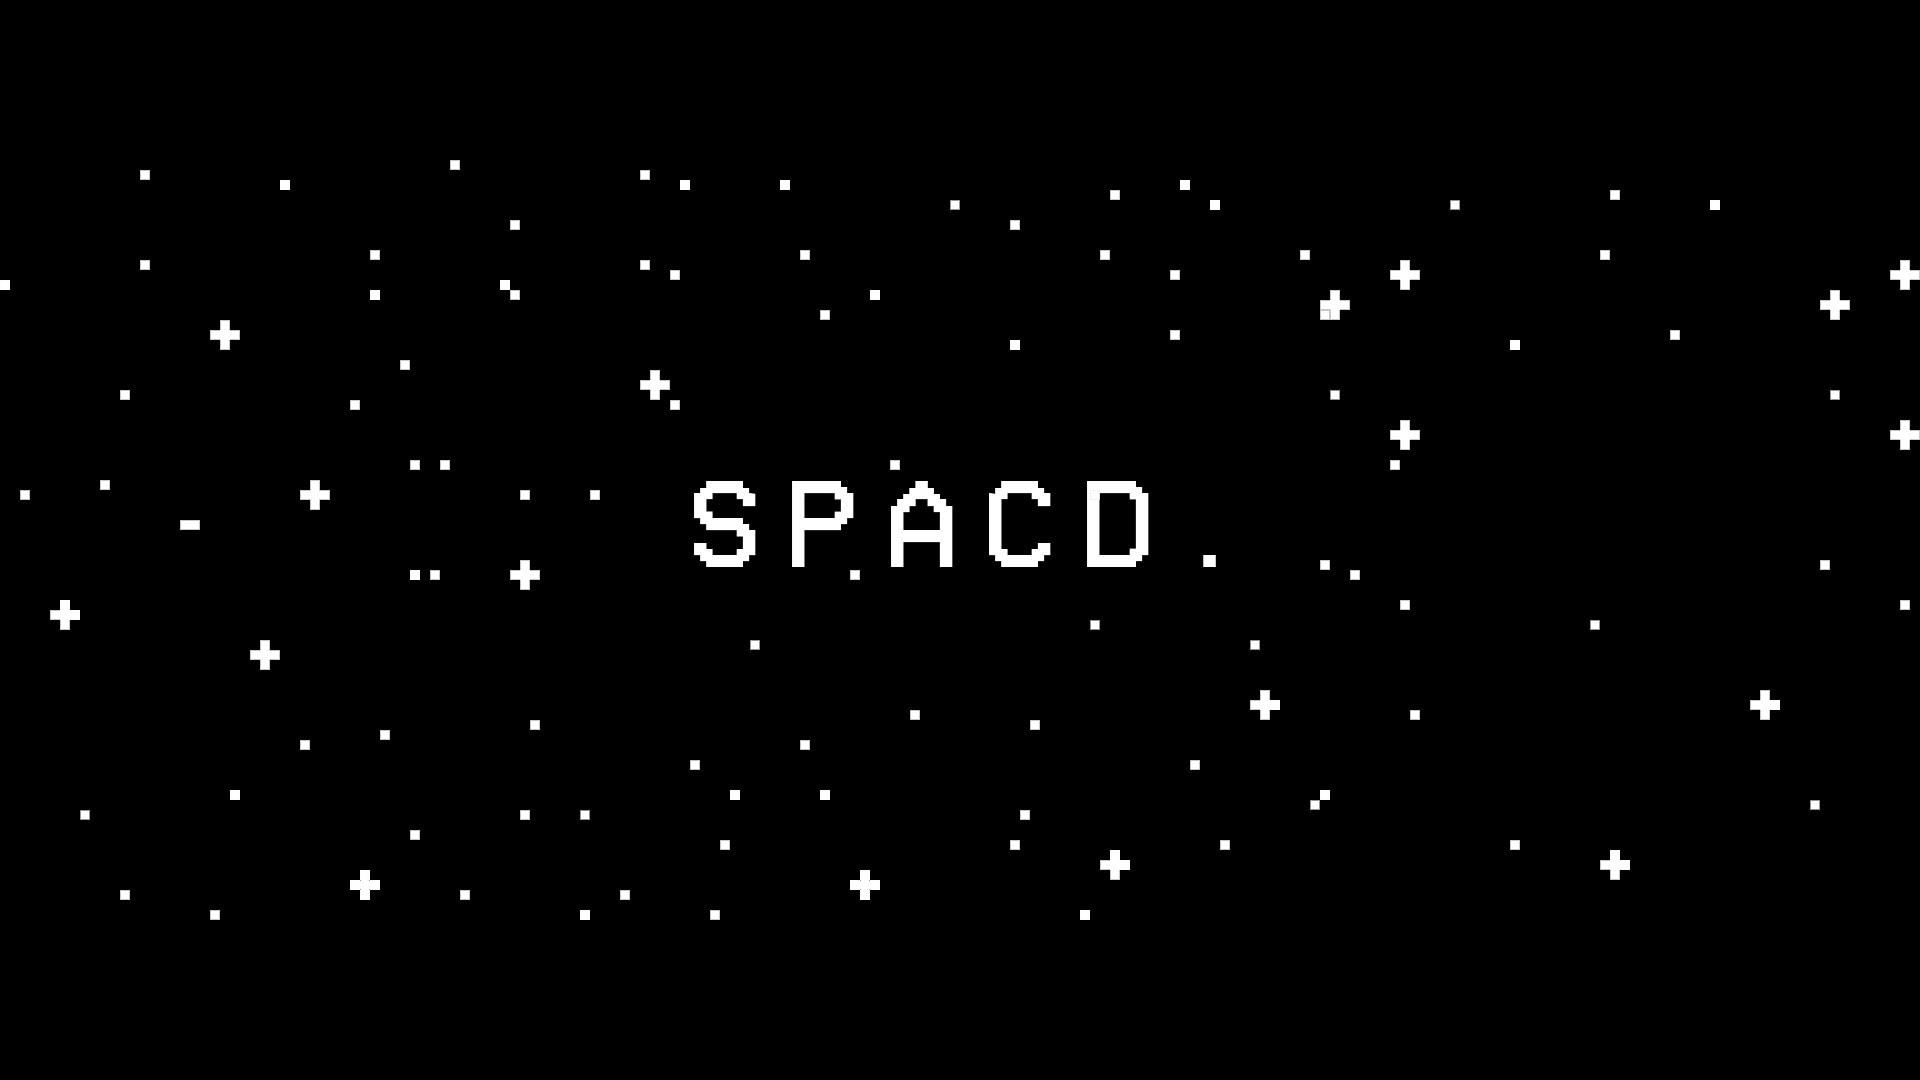 spacd. brand Store